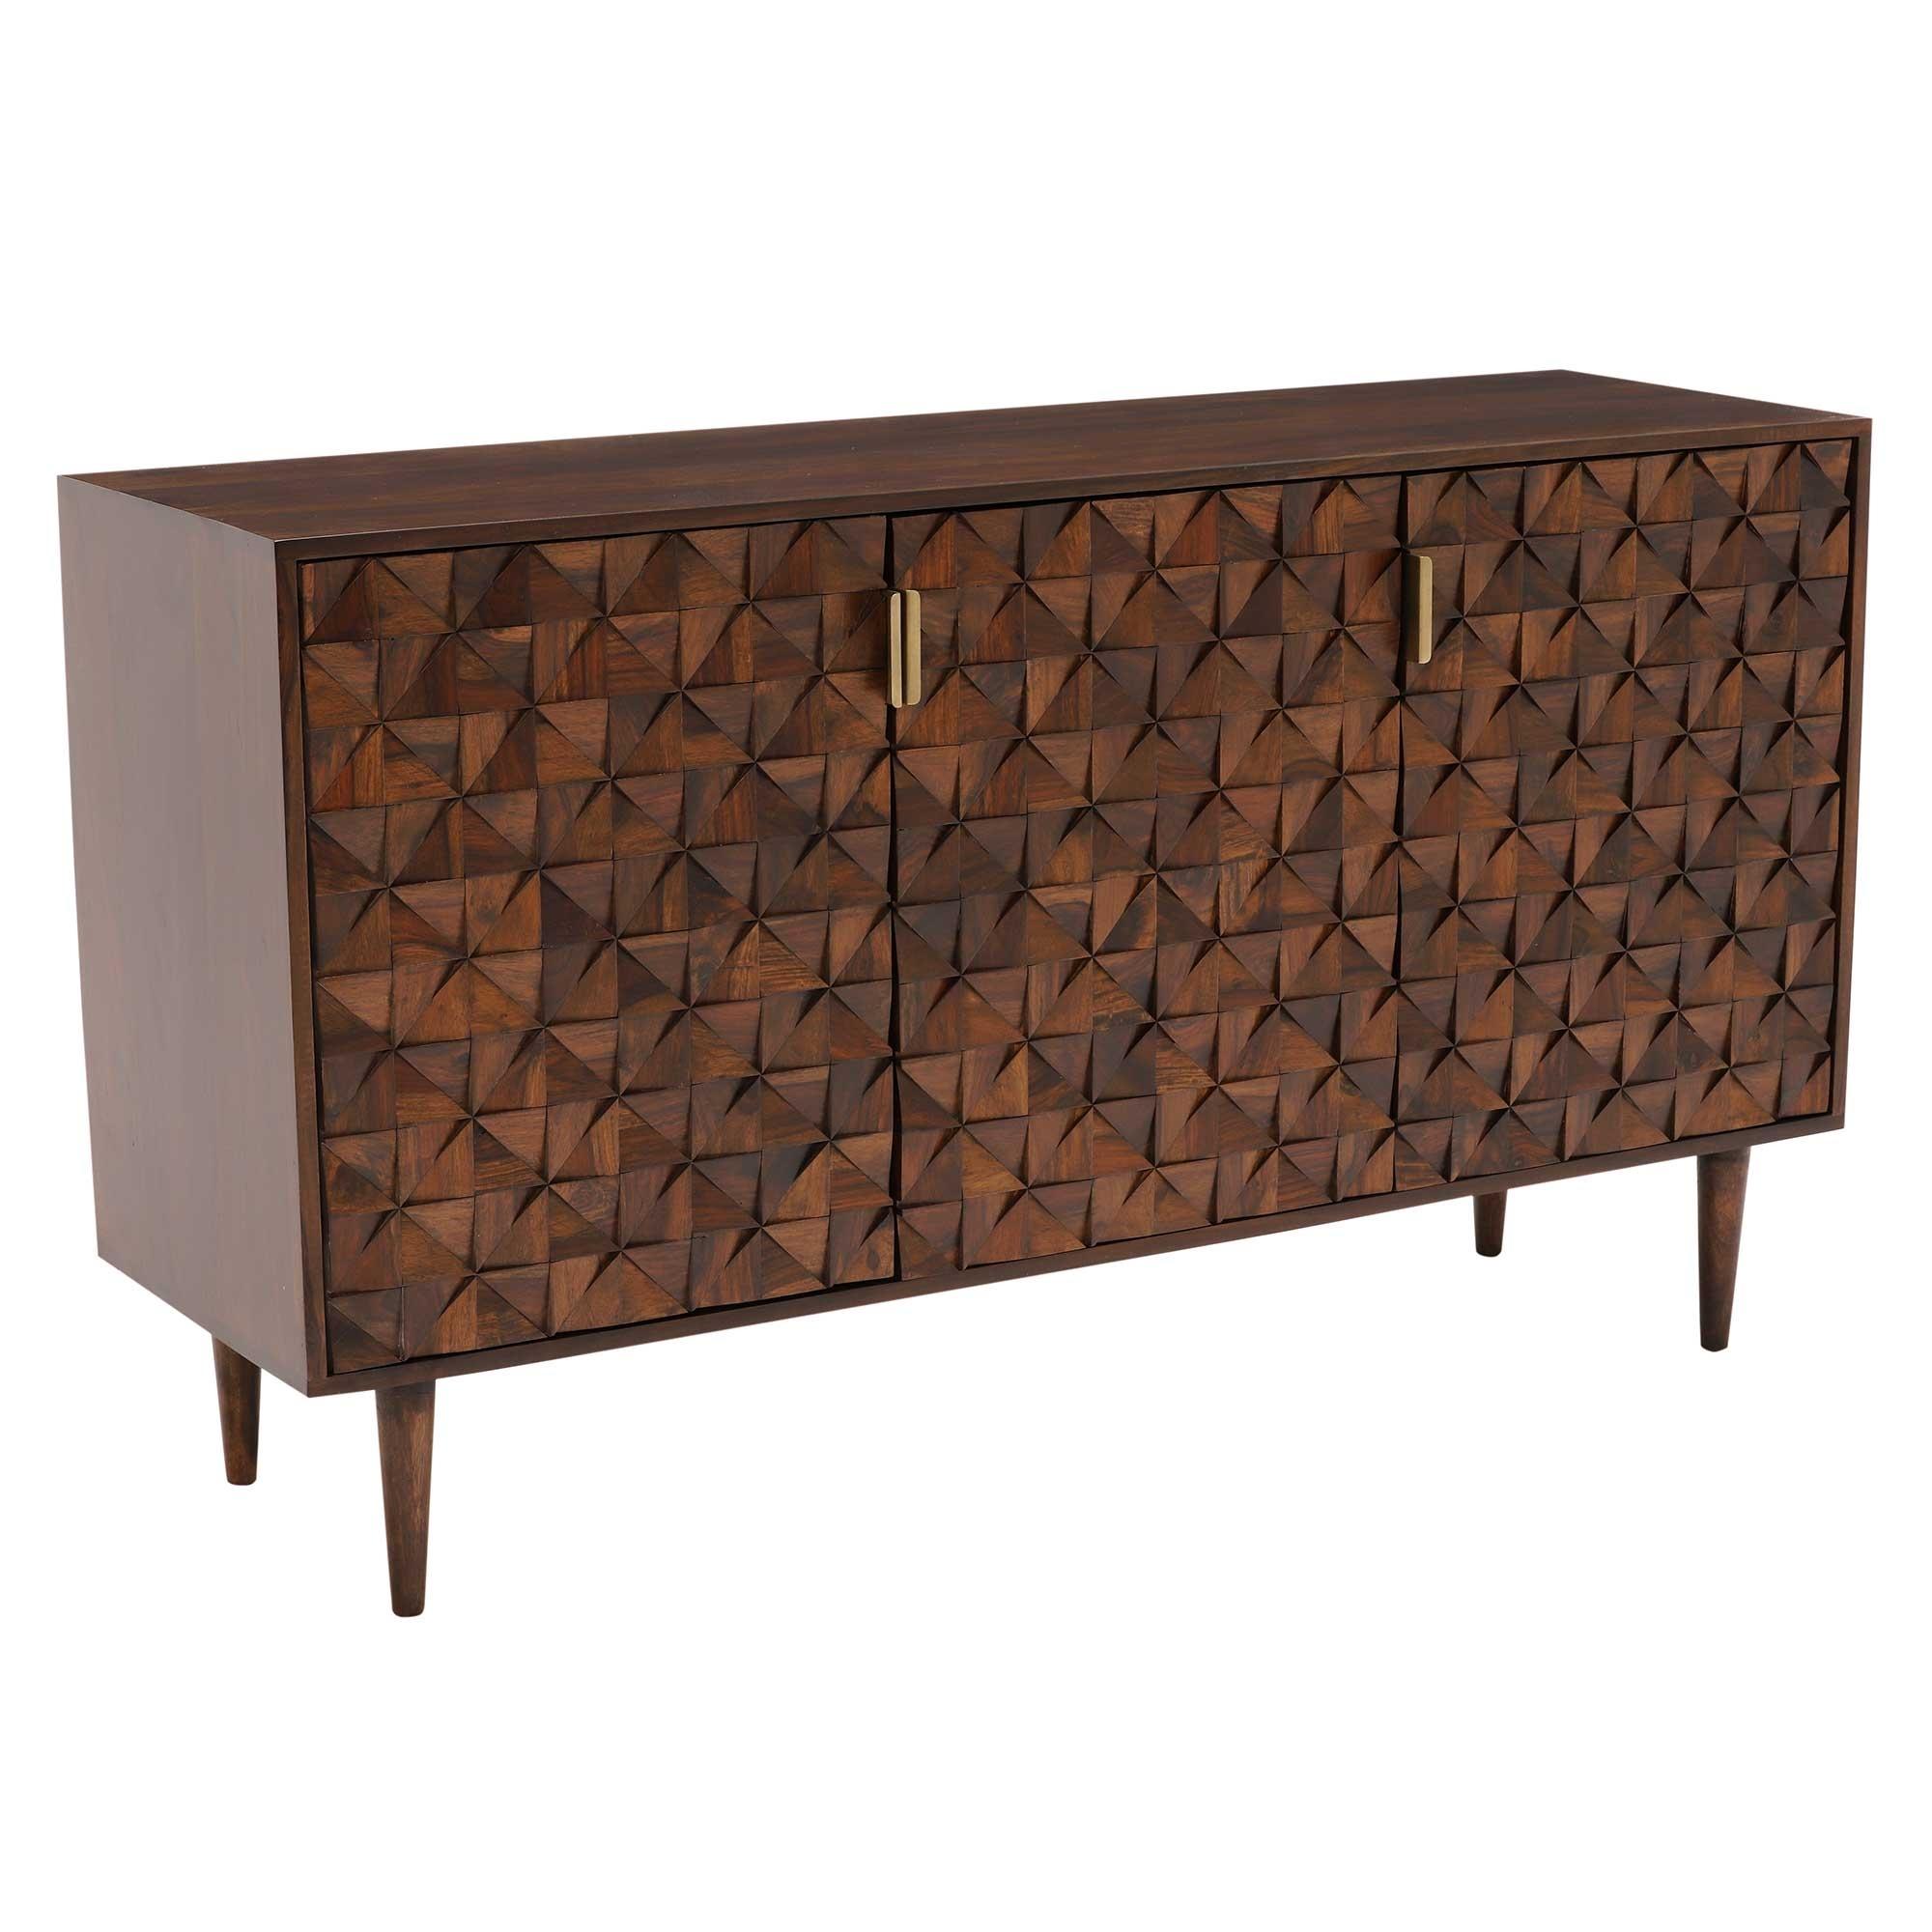 Kiro 3 Door Sideboard, American Walnut | Sideboards | Dining Room In Walnut Finish 2 Door/3 Drawer Sideboards (Photo 5 of 30)